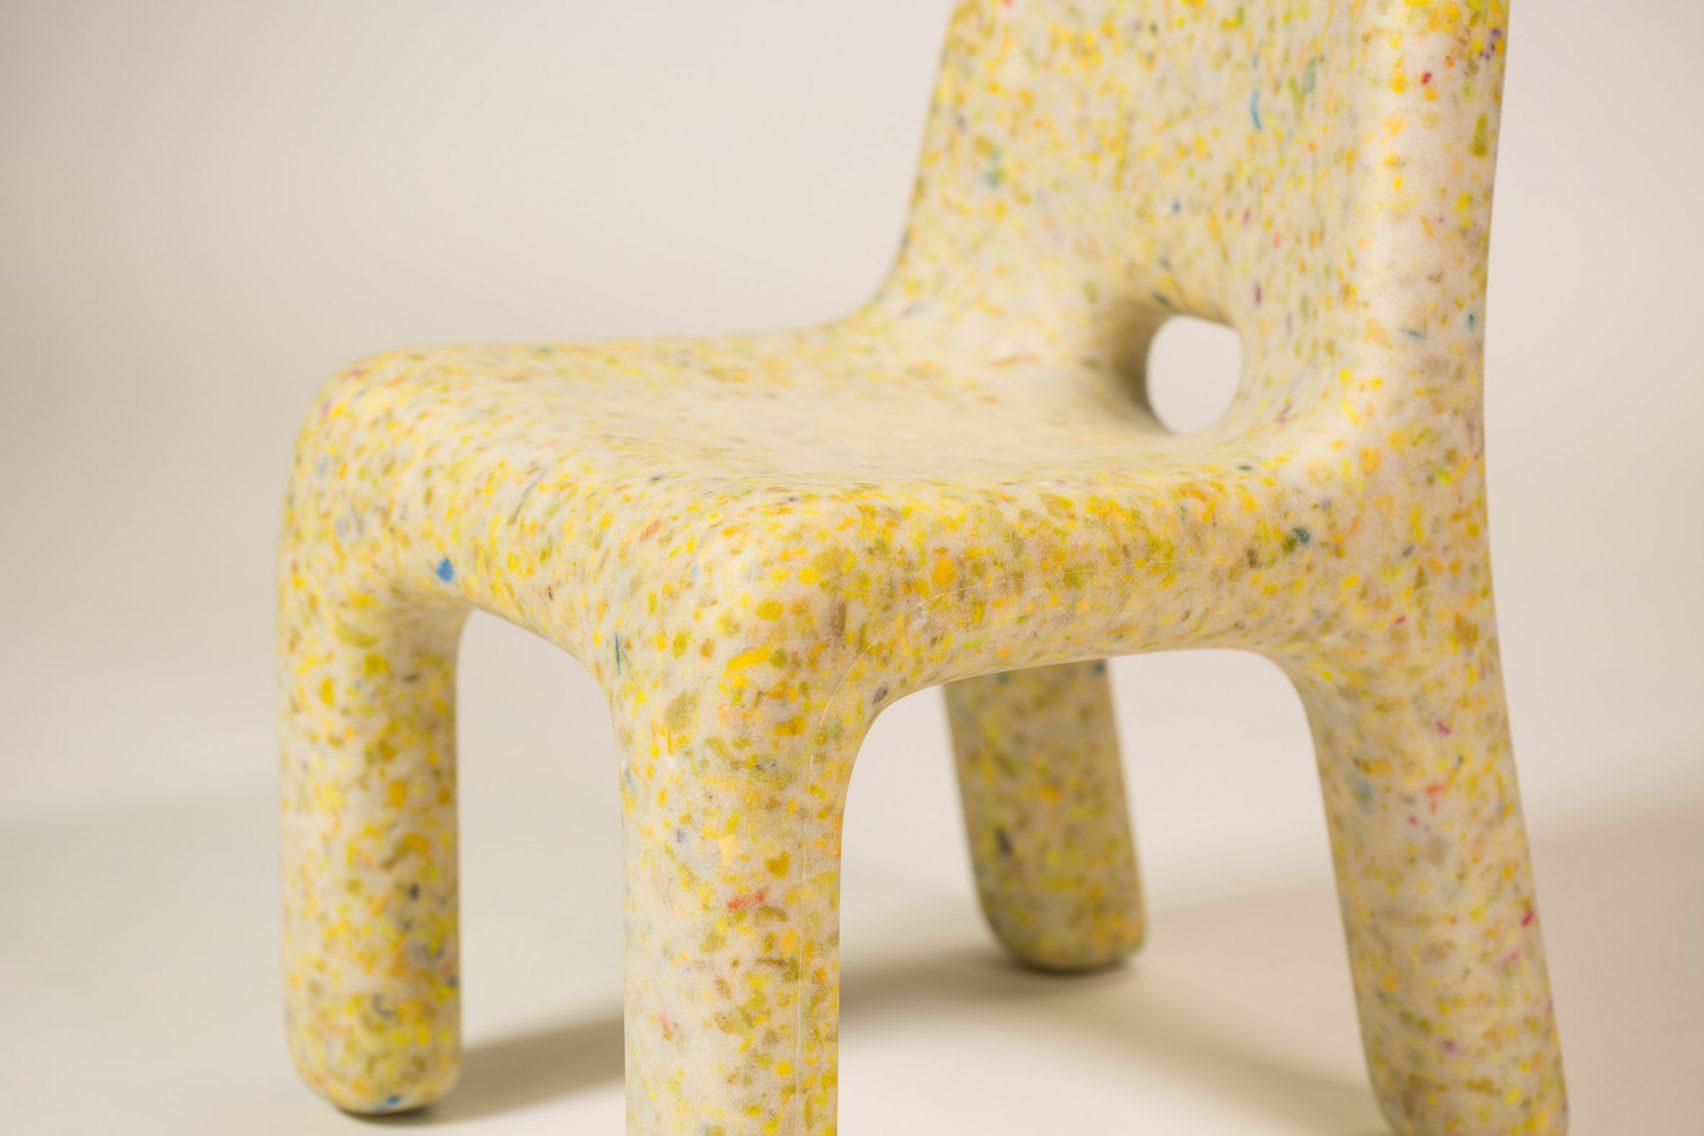 ecobirdy-childrens-furniture-design-maison-objet-recycled-plastic_dezeen_2364_col_4-1704x1136